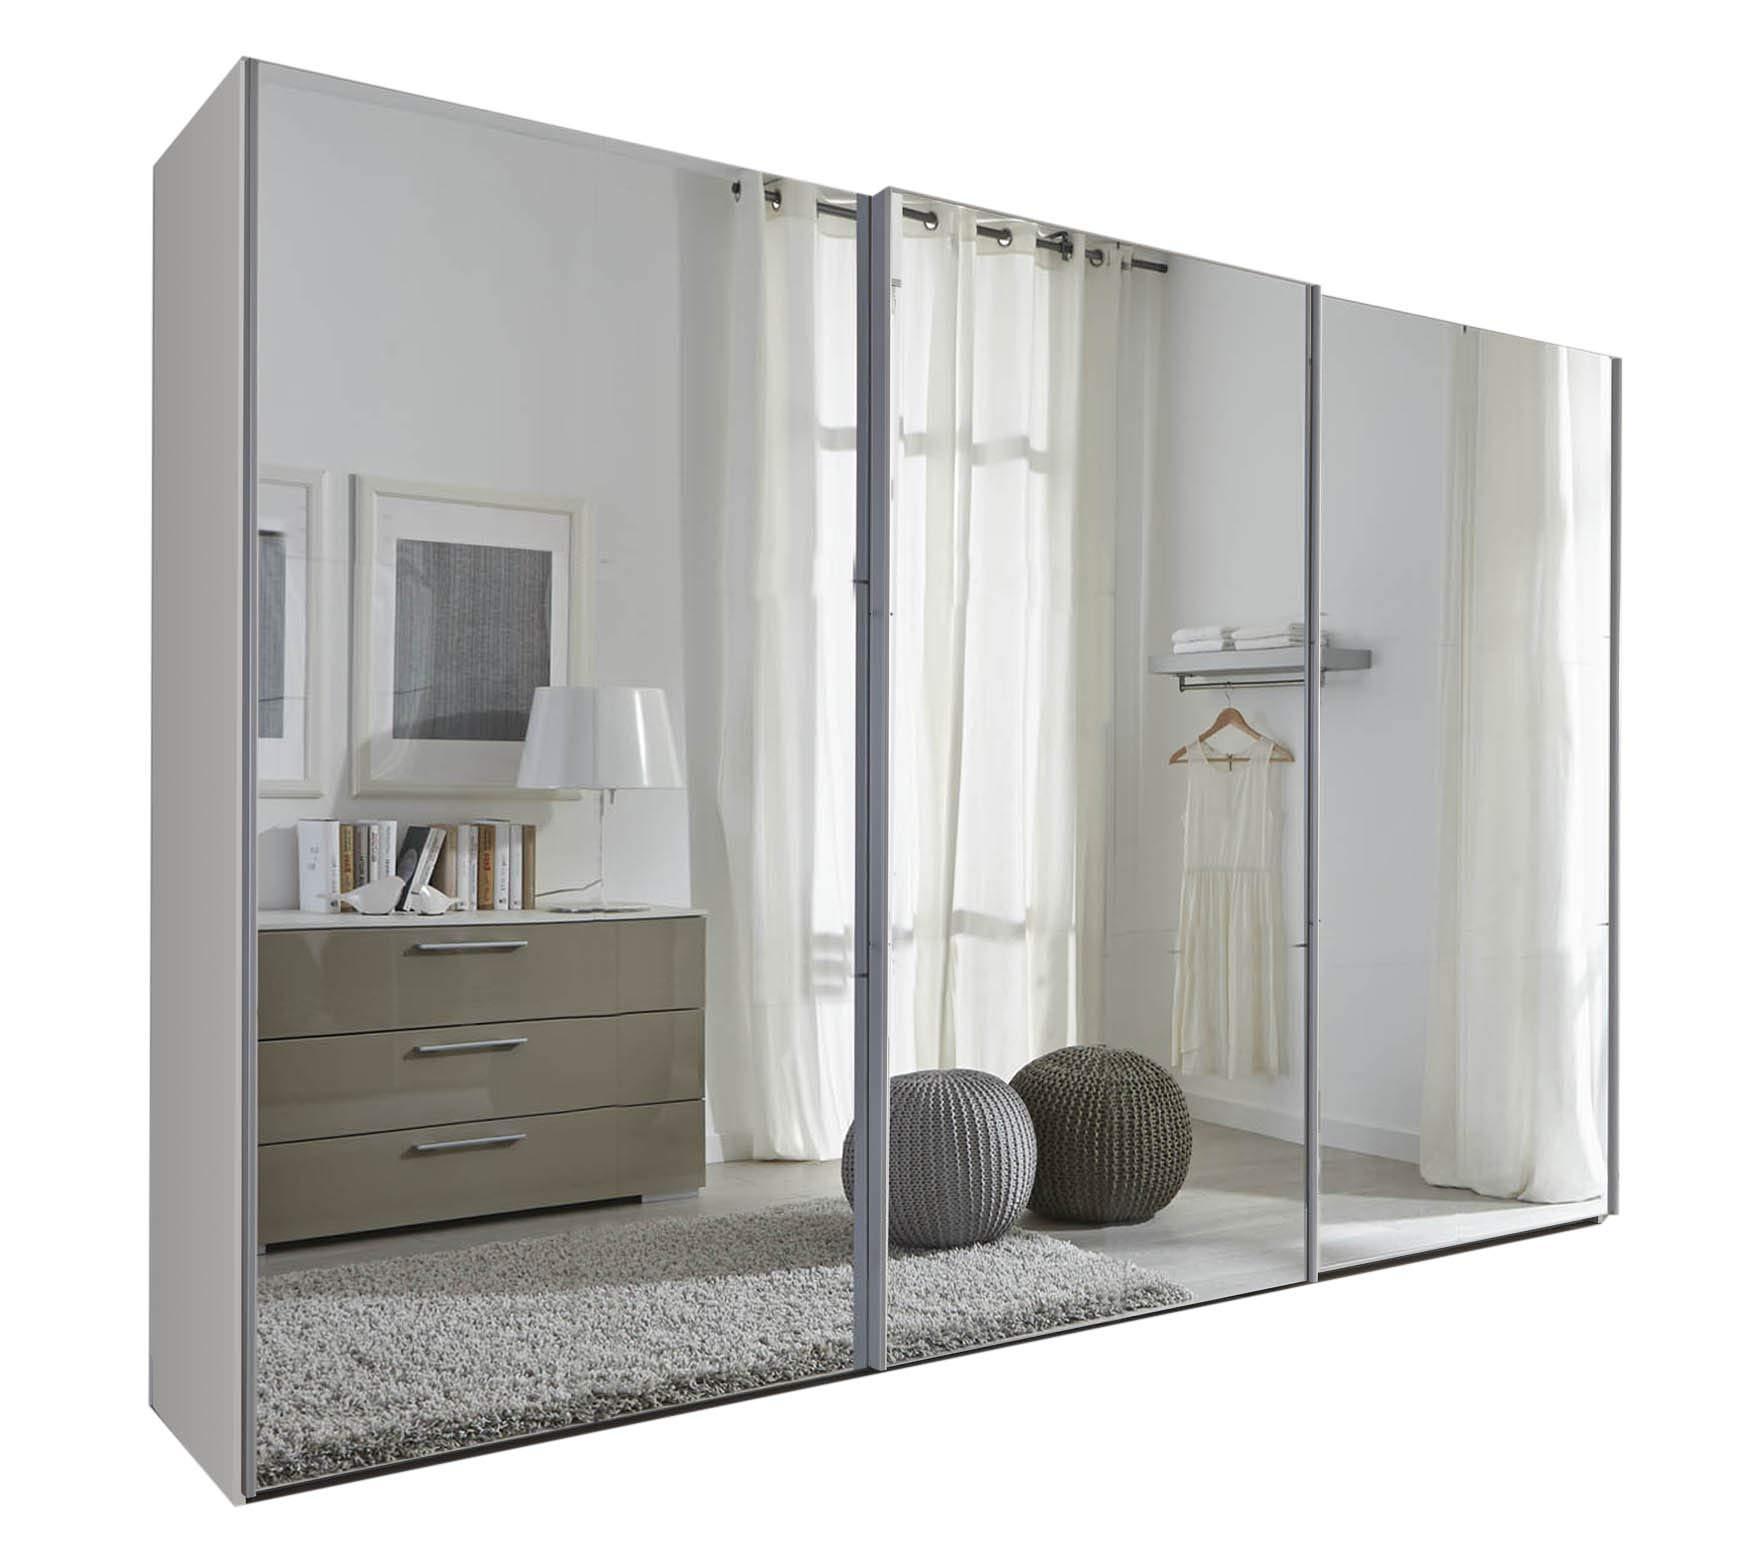 Schlafzimmer Komet White Mirror Sliding Door Wardrobe 301cm Wide German Made Bedroom Furniture Buy Online In Guatemala At Guatemala Desertcart Com Productid 90740842